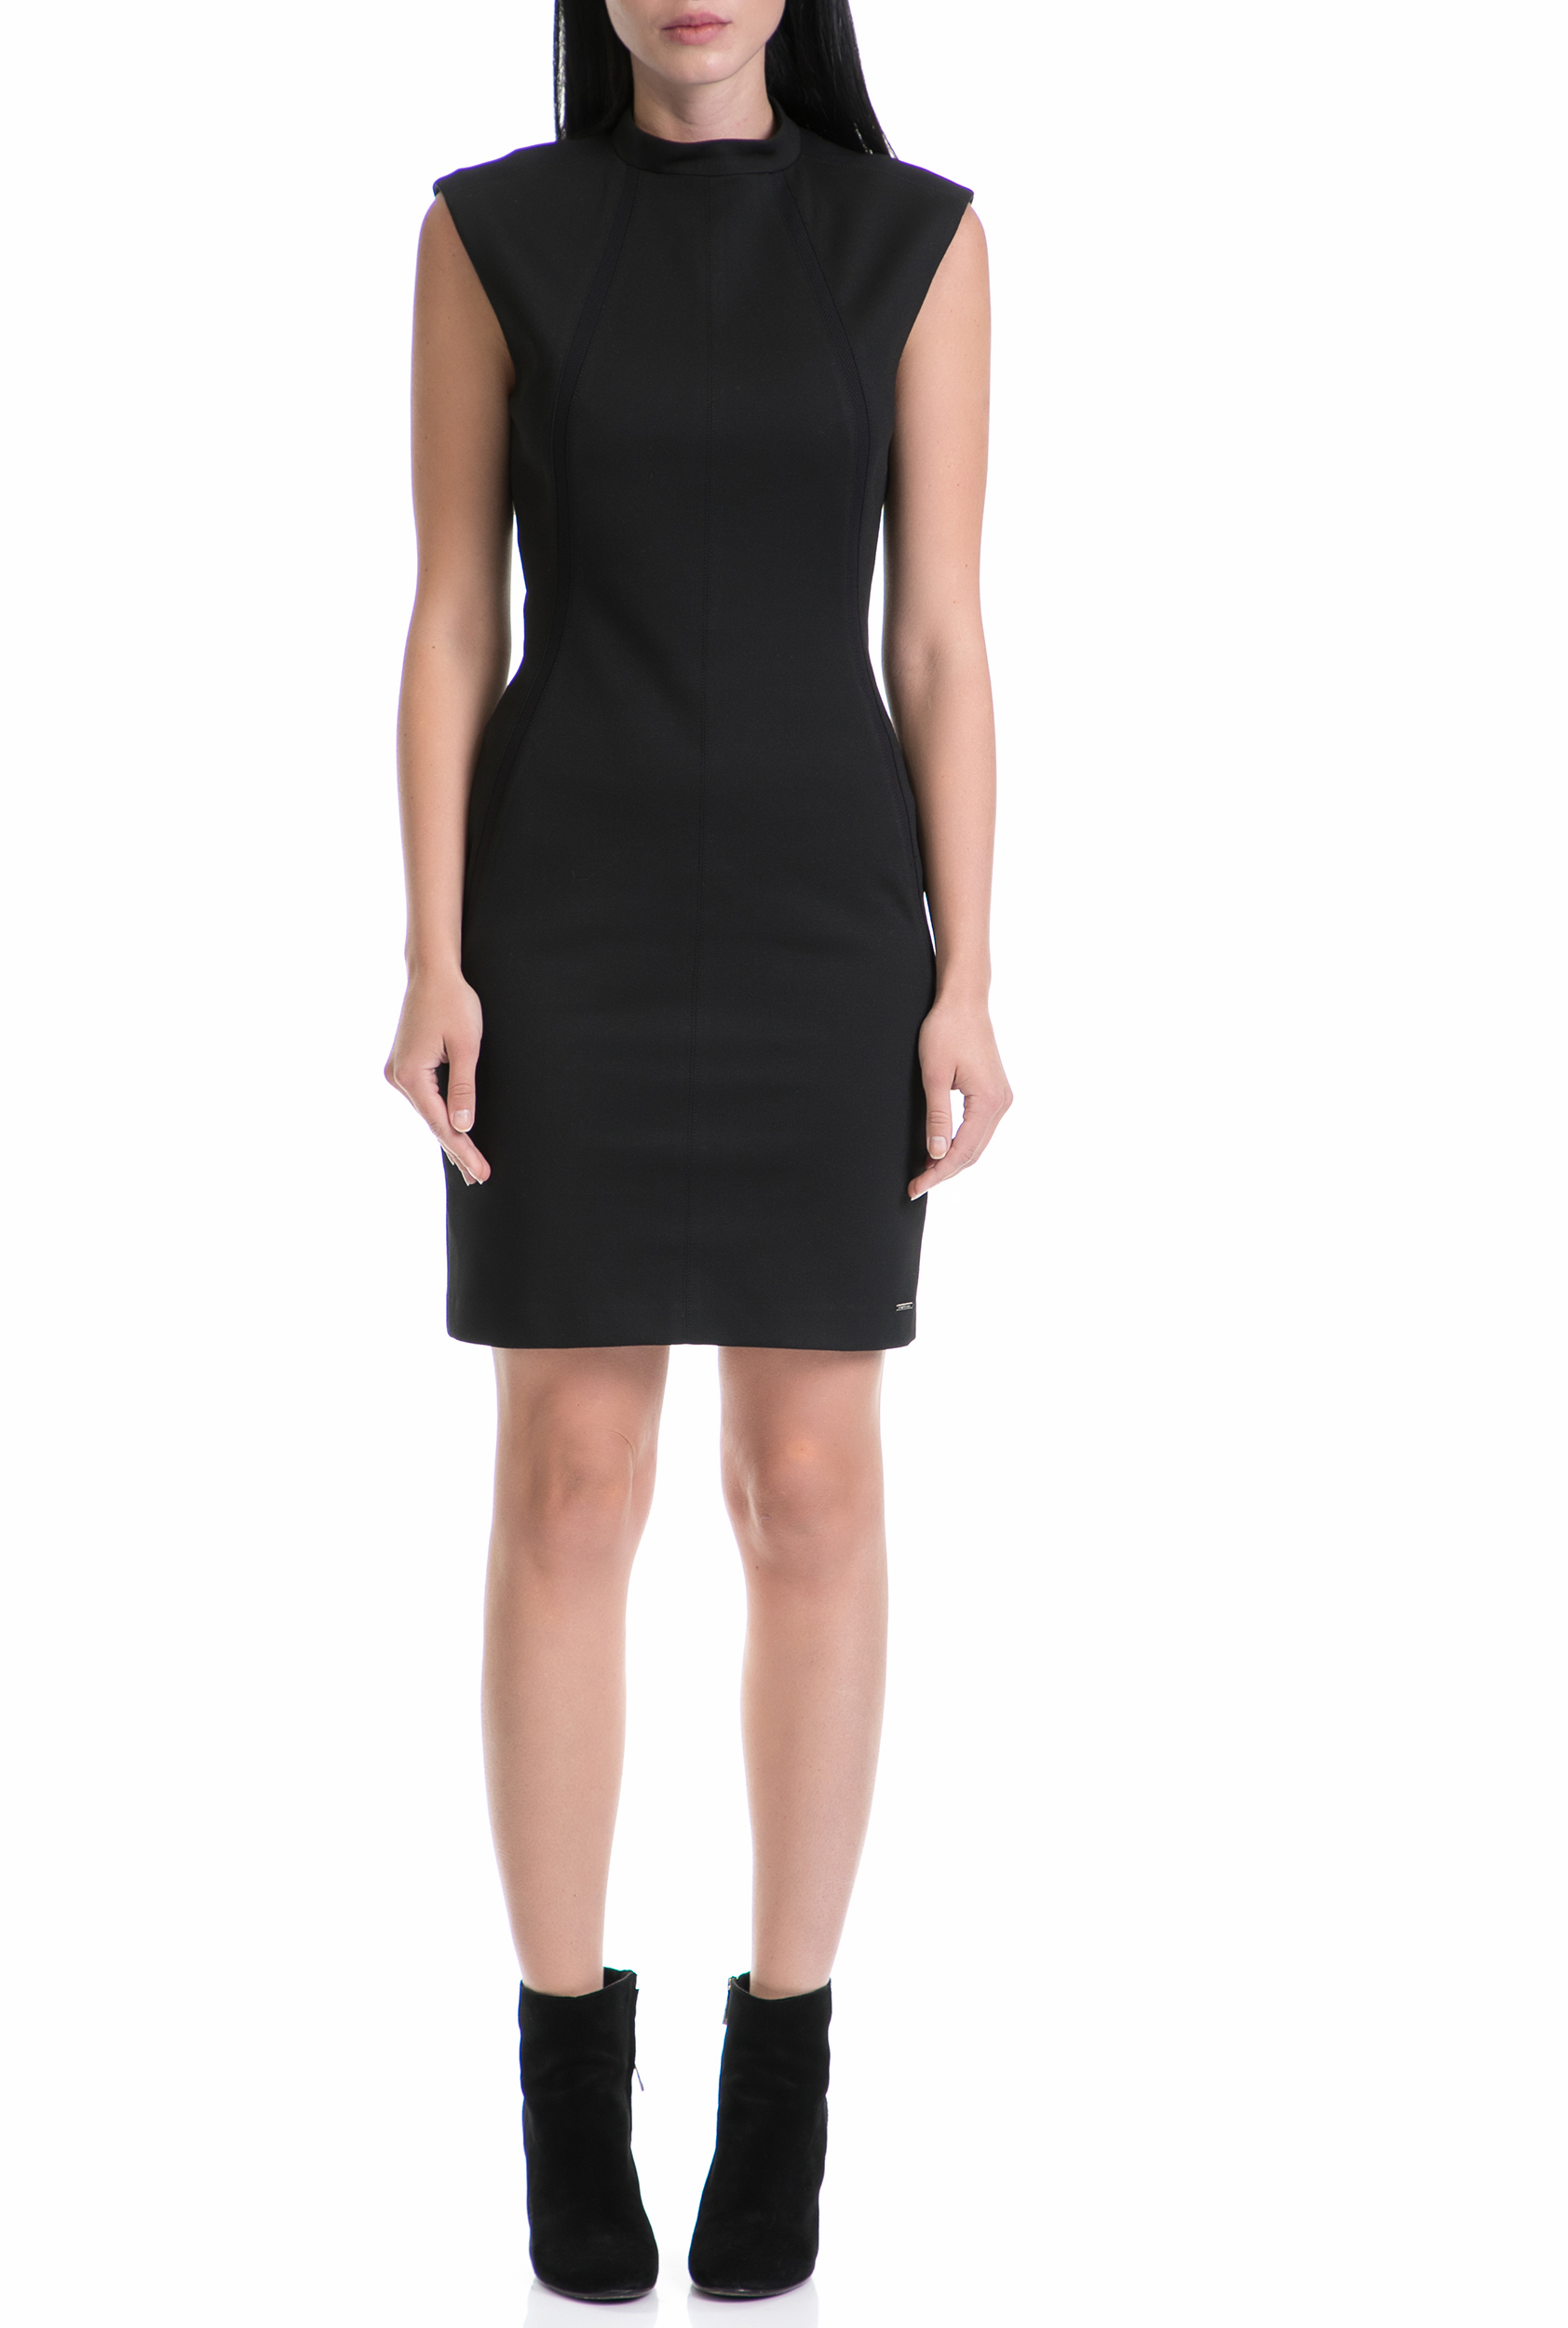 CALVIN KLEIN JEANS - Γυναικείο φόρεμα DAYAS CALVIN KLEIN JEANS μαύρο γυναικεία ρούχα φορέματα μίνι